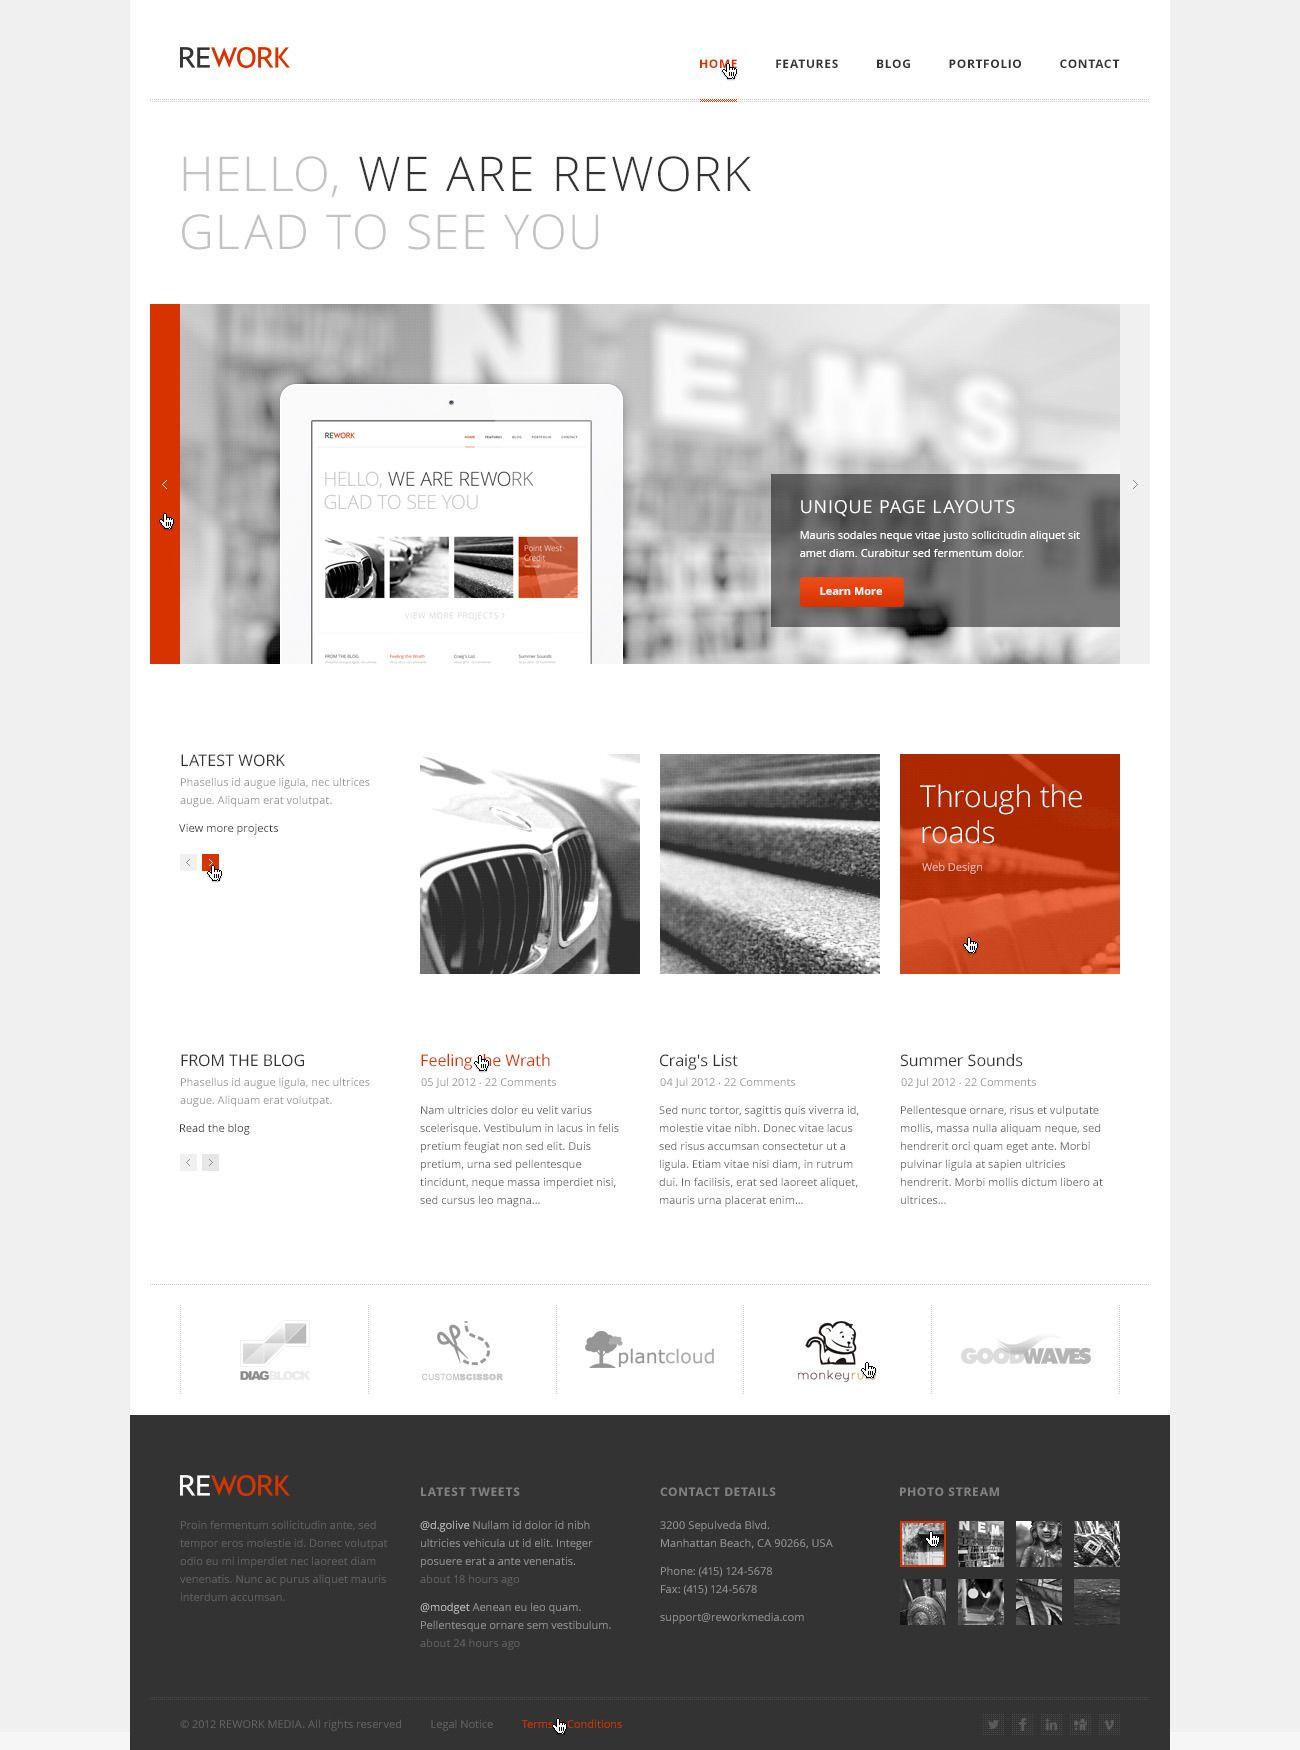 REWORK - Responsive HTML5/CSS3 Template | Pinterest | Psd templates ...